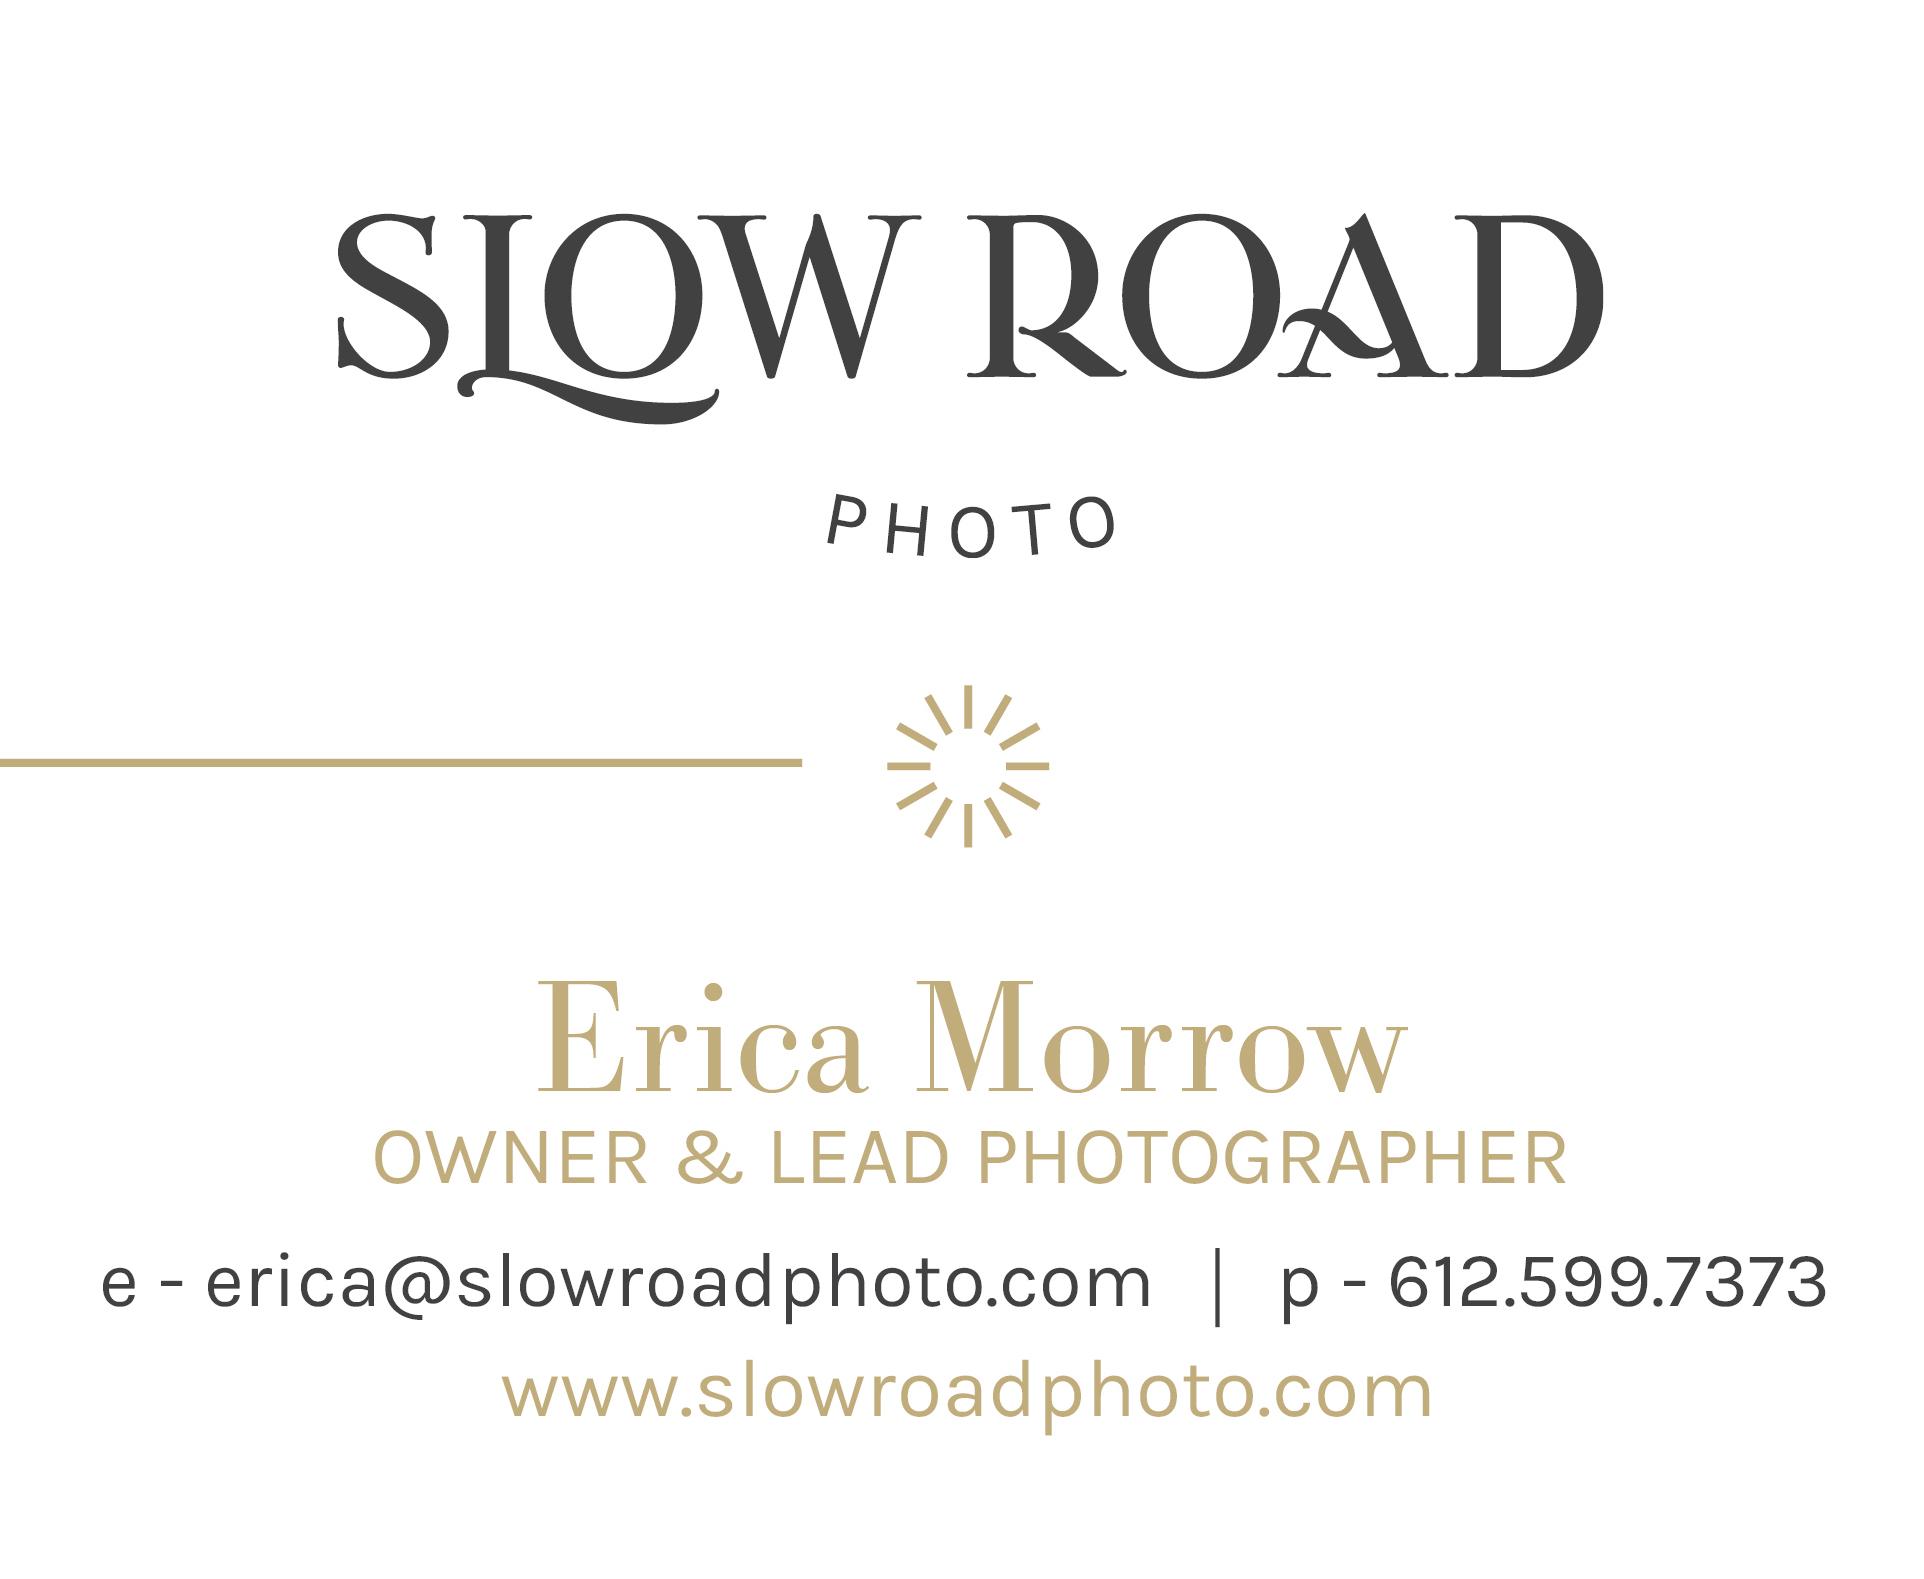 https://www.slowroadphoto.com